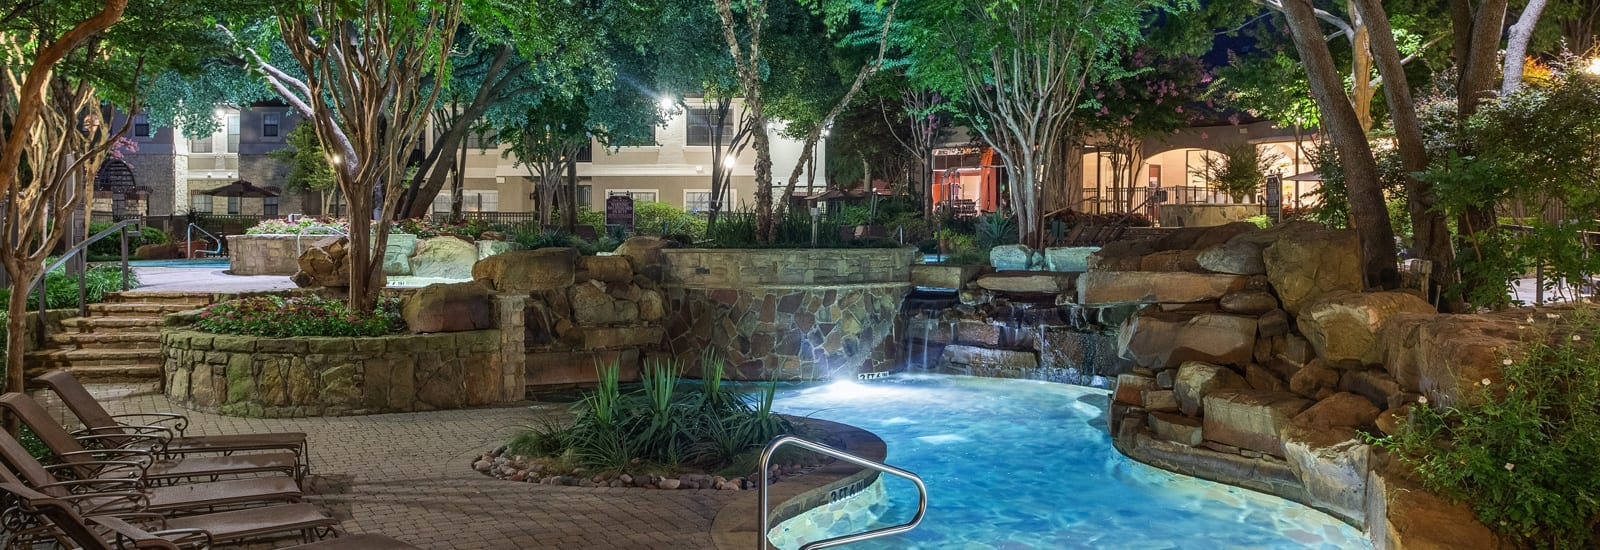 Apartments in Dallas TX